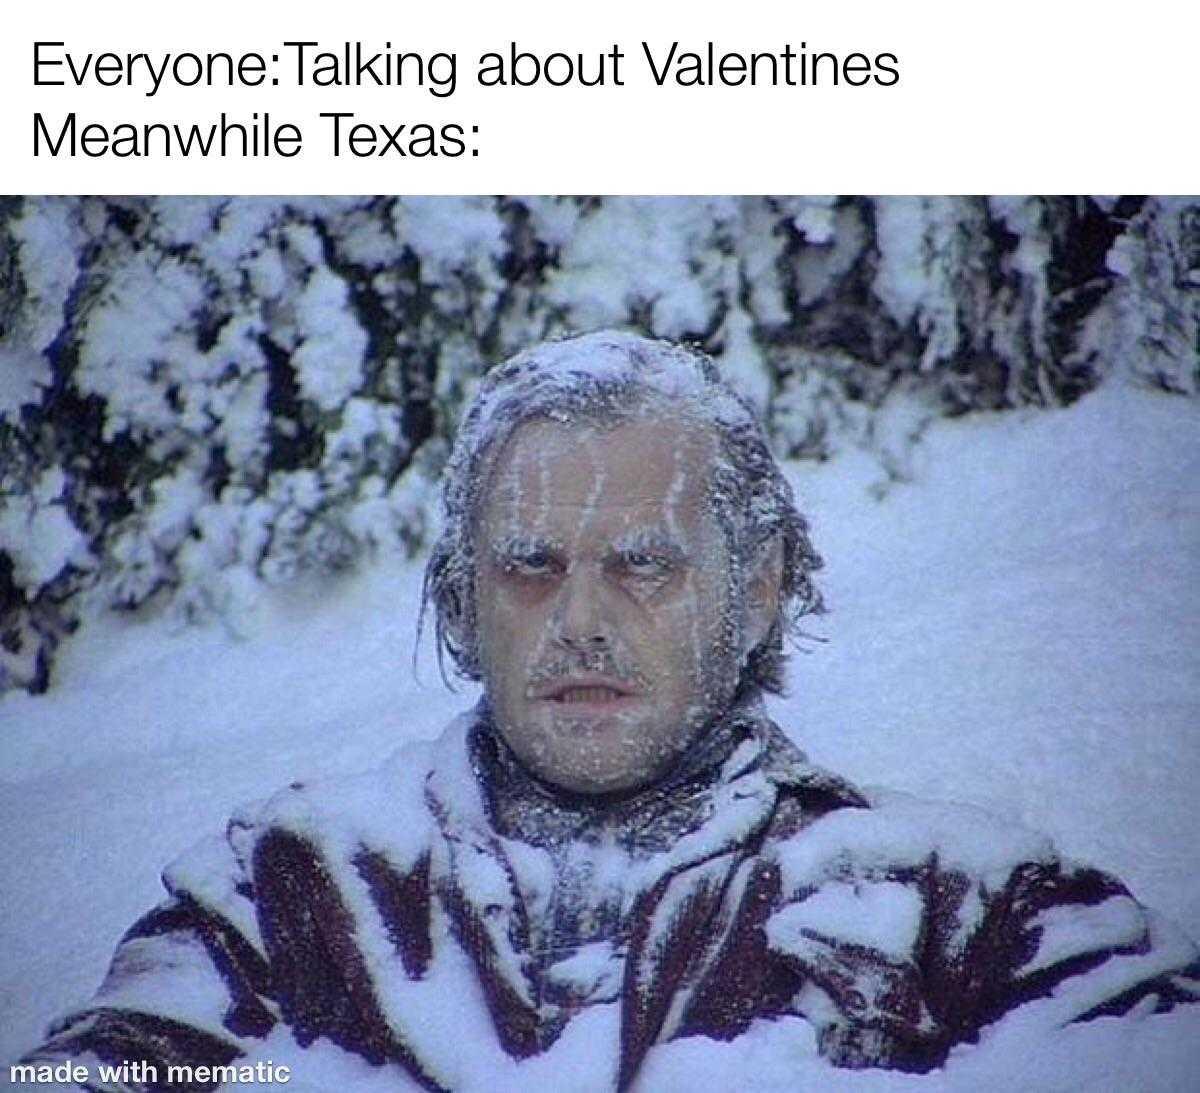 Texas Freeze Memes - Winter Sending Some Love